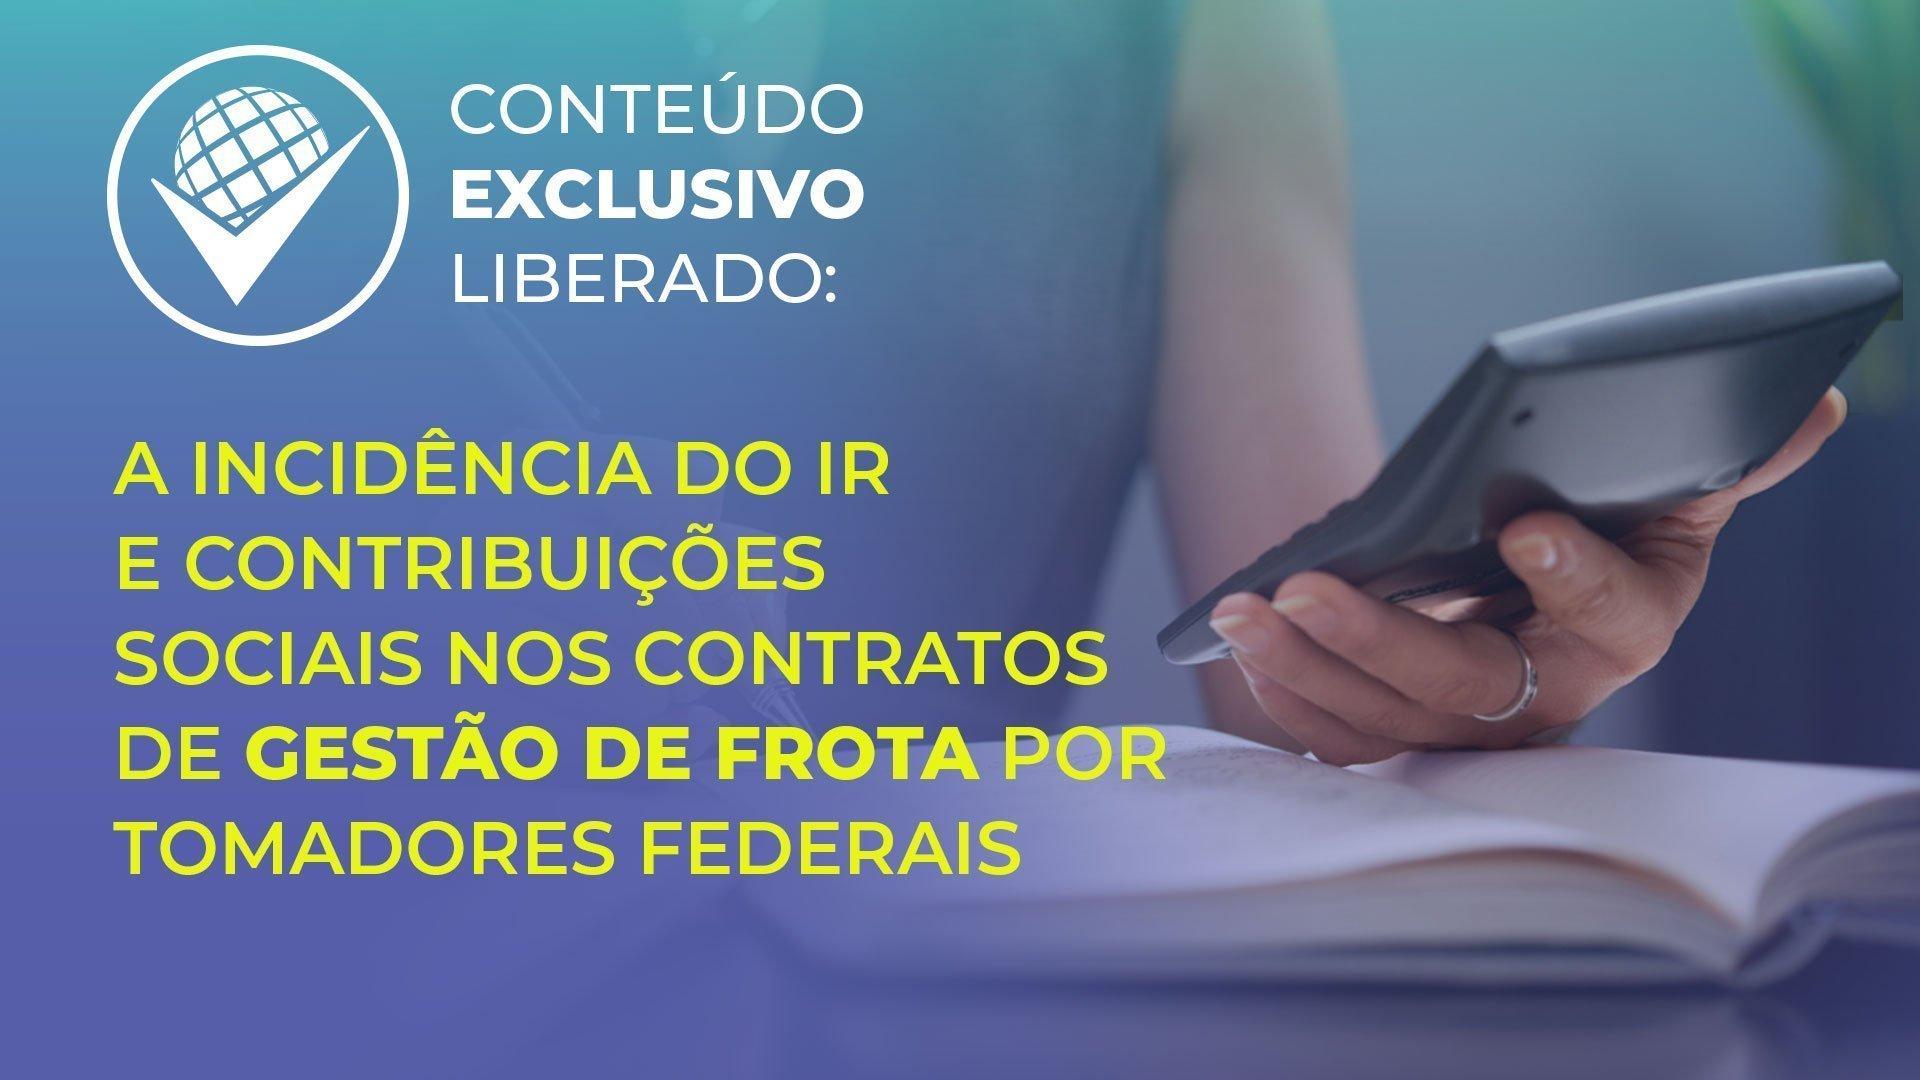 a-incidencia-do-ir-e-contribuicoes-sociais-nos-contratos-de-gestao-de-frota-por-tomadores-federais